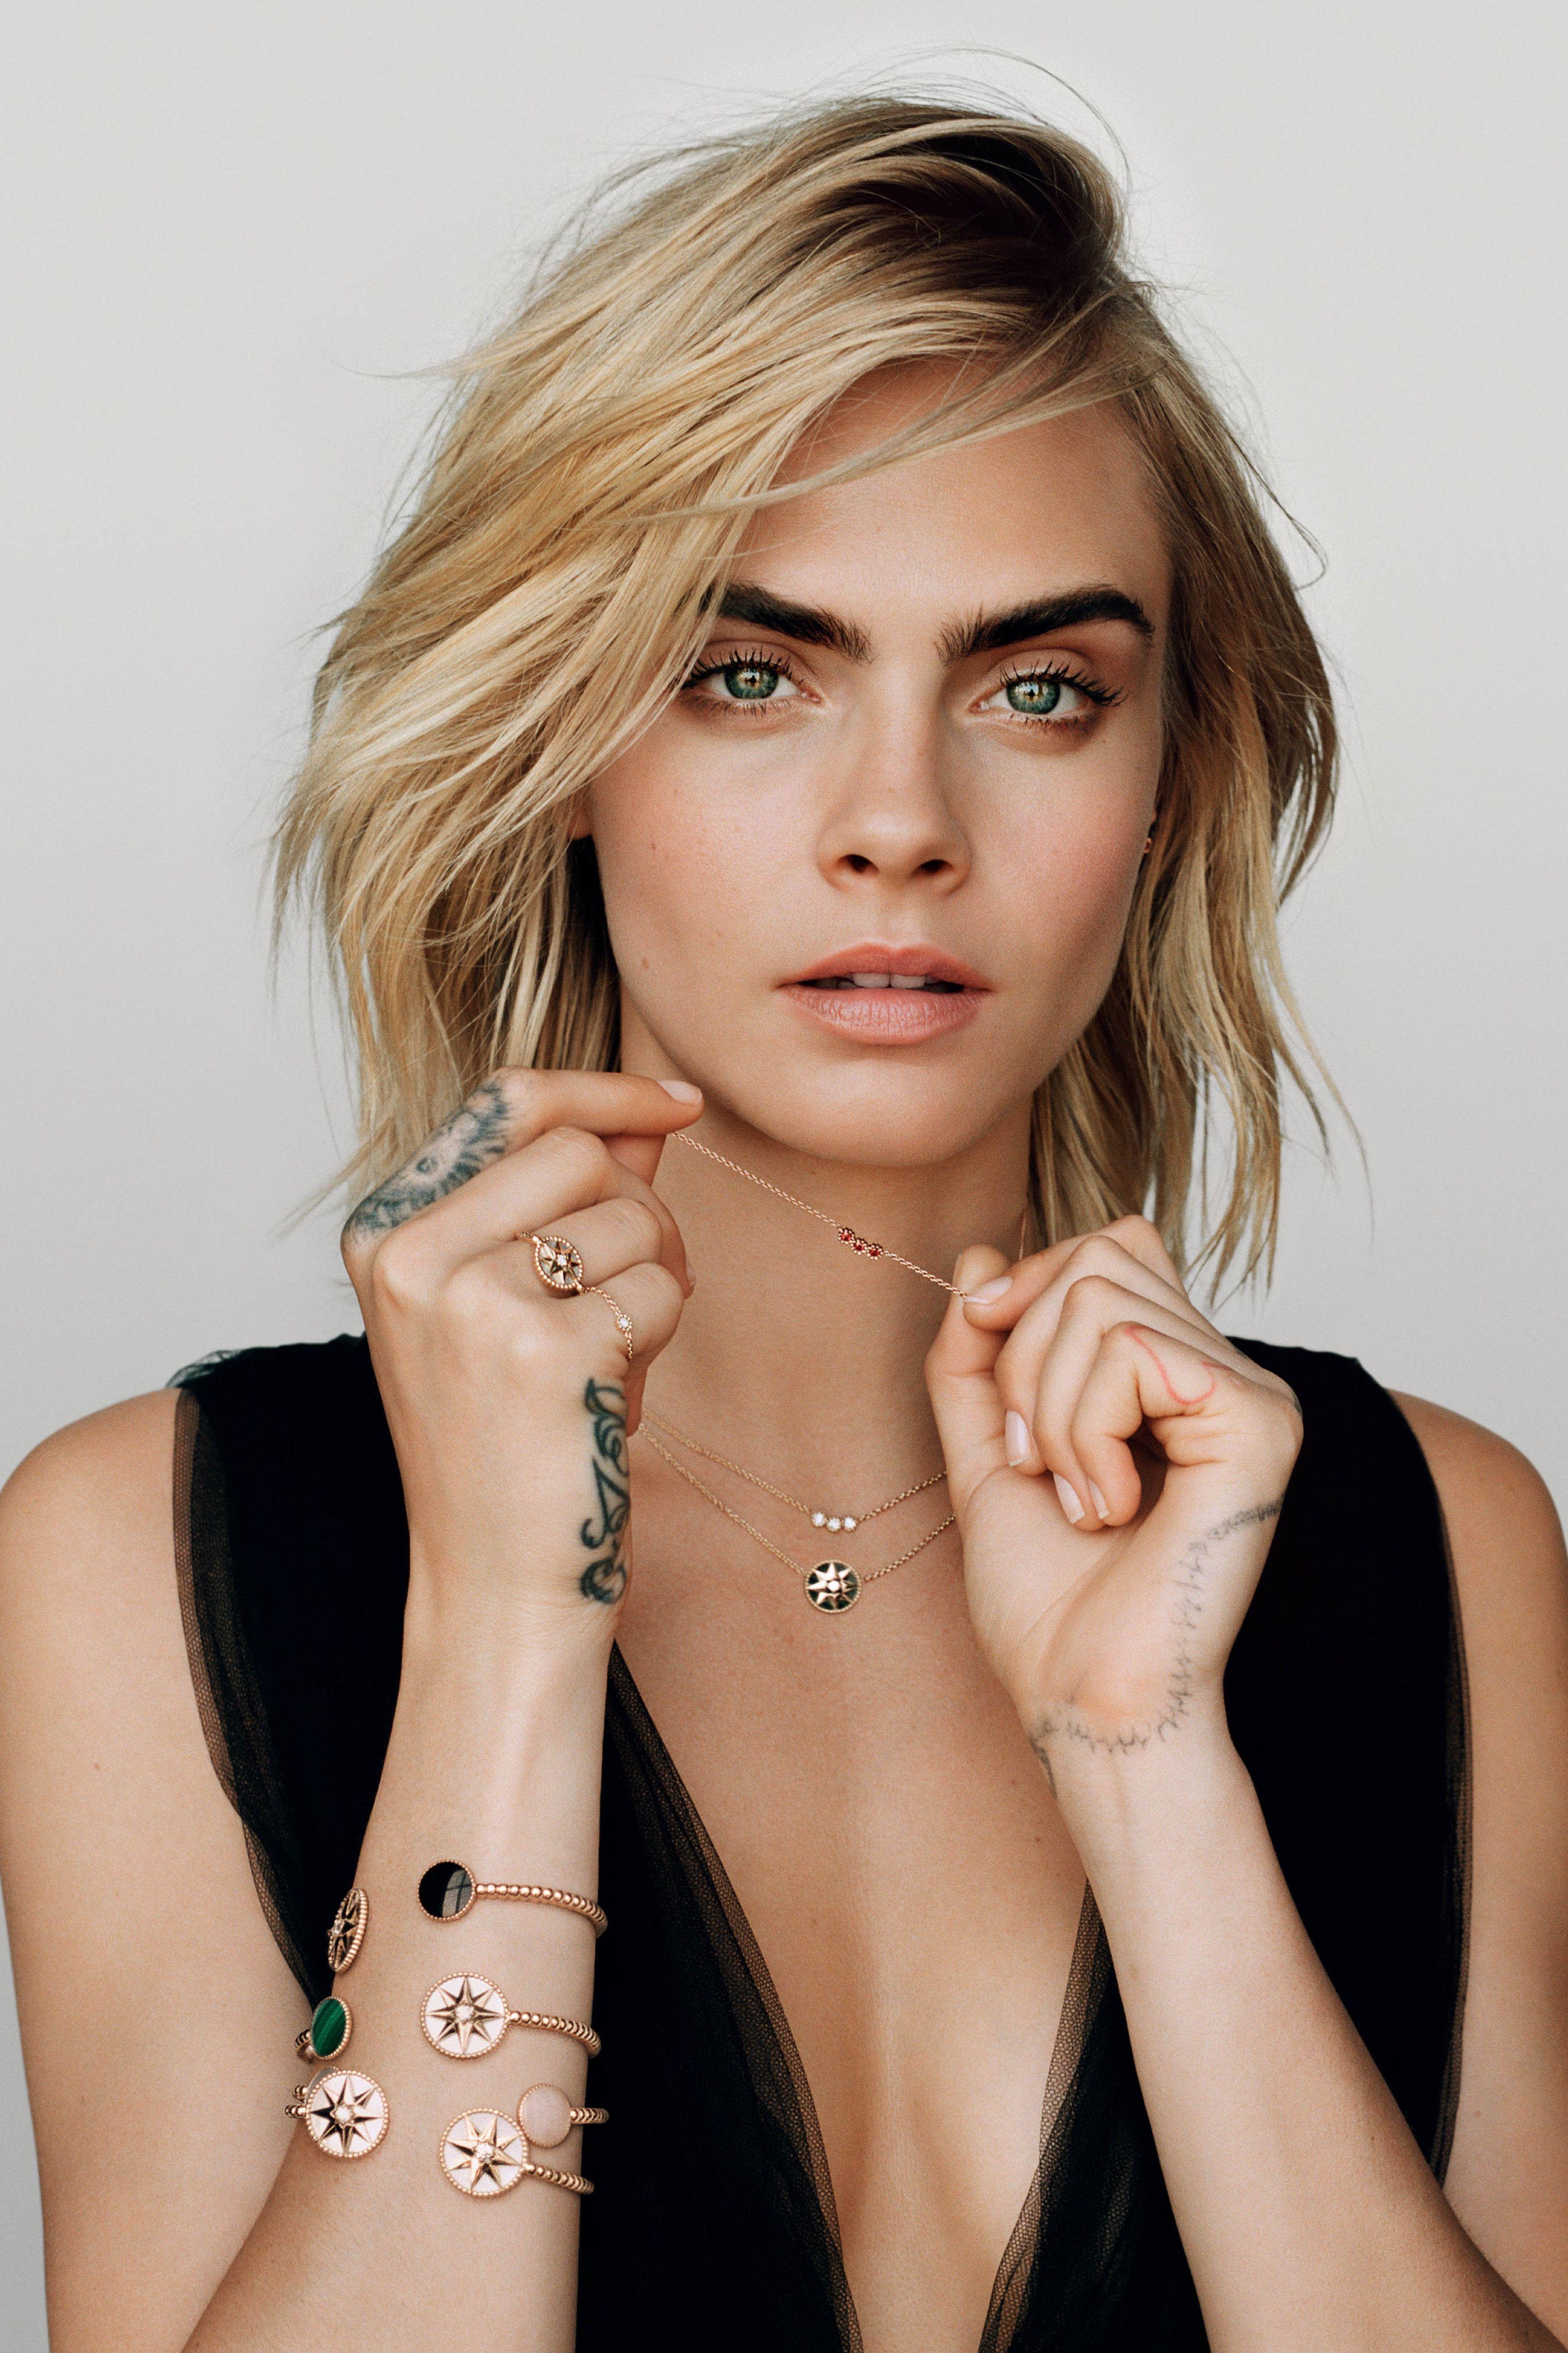 Cara Delevingne Dior Joaillerie In 2020 Cara Delevingne Photoshoot Cara Delevingne Style Cara Delevingne Hair